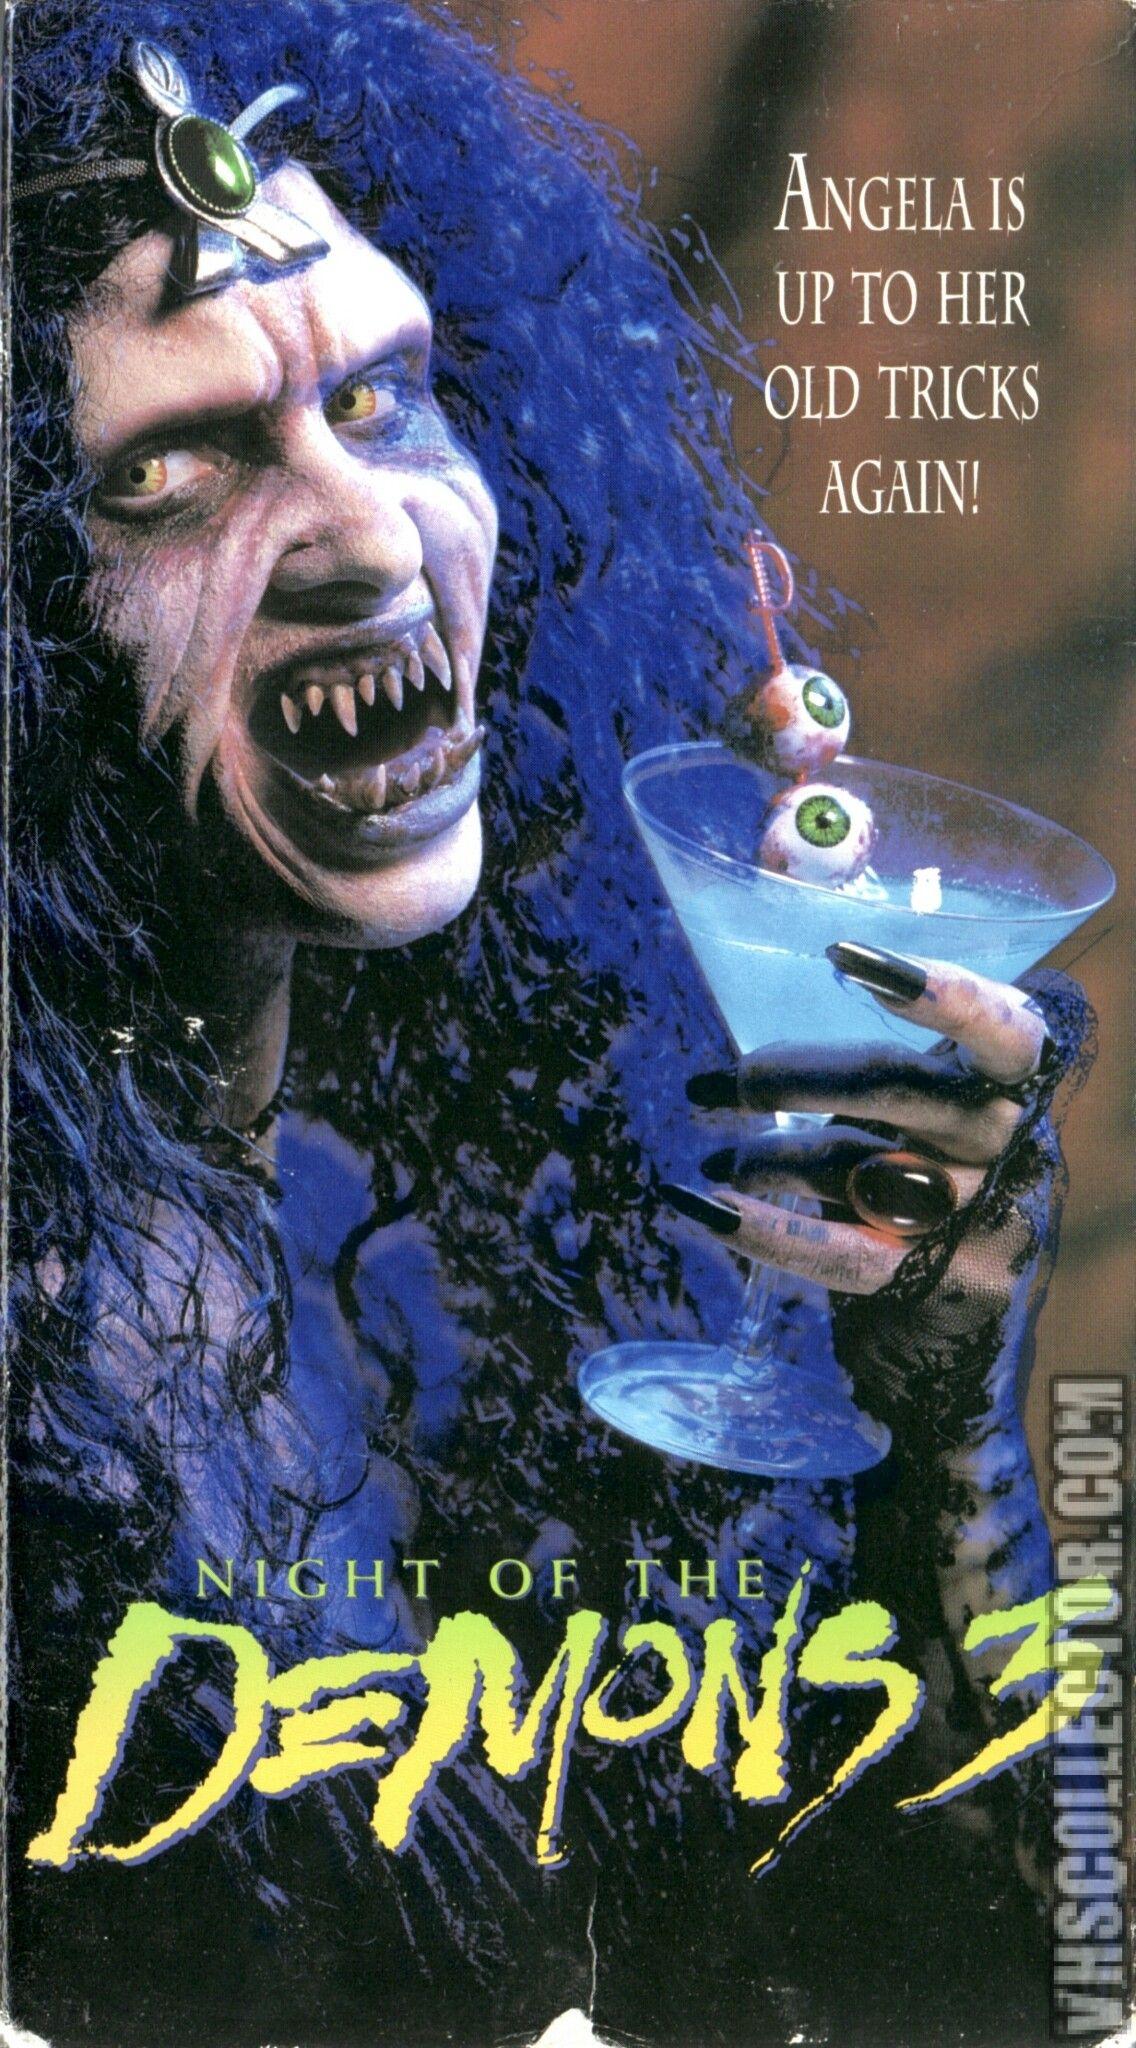 Night of the Demons 3 (1997) | Night of the demons, Demon